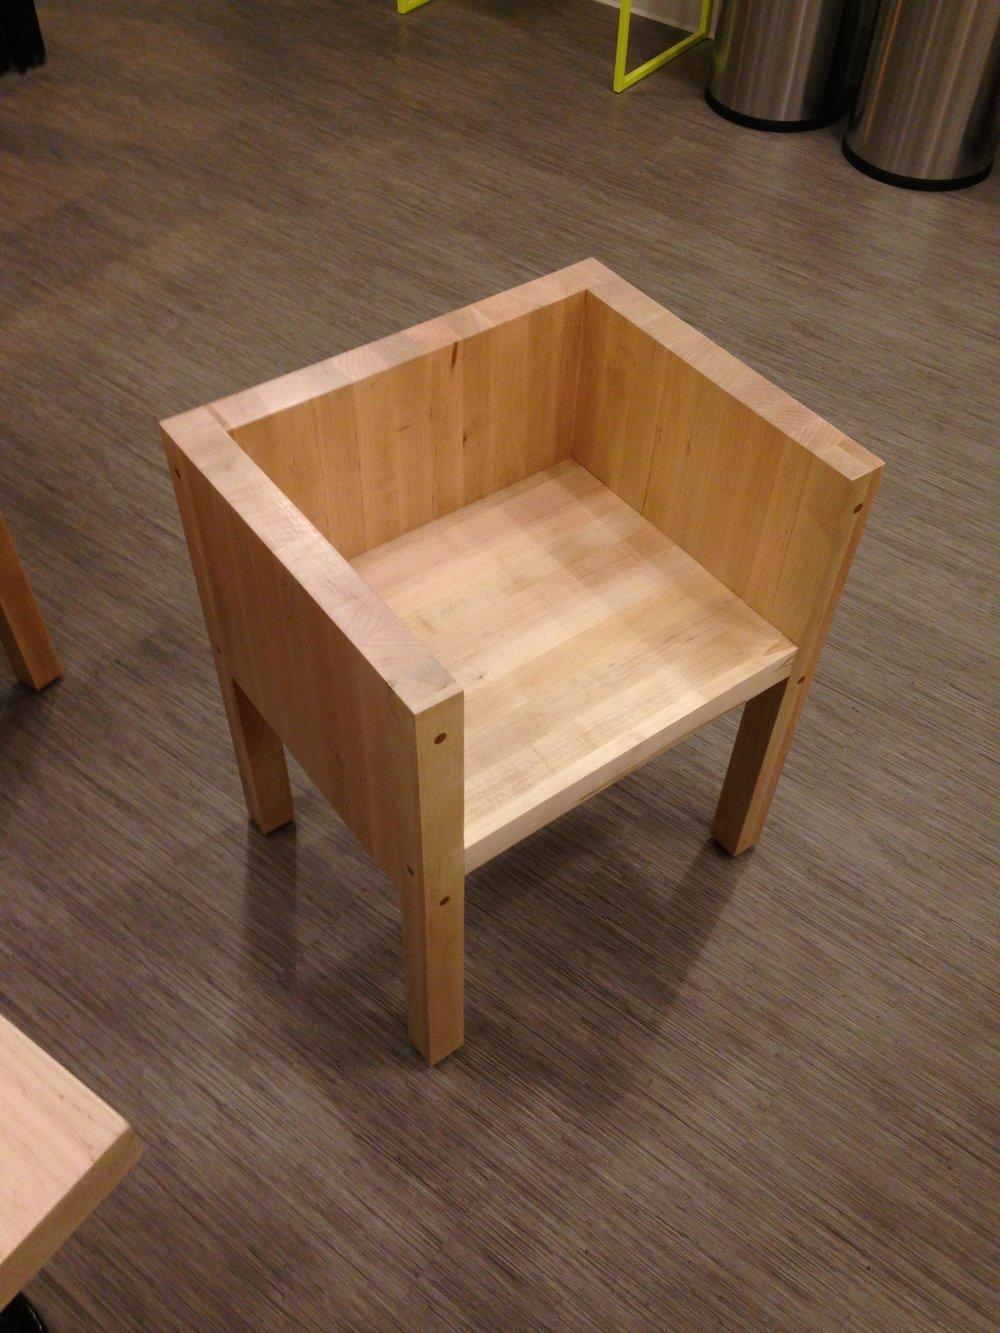 Cafe Chair John Paul Costello.JPG